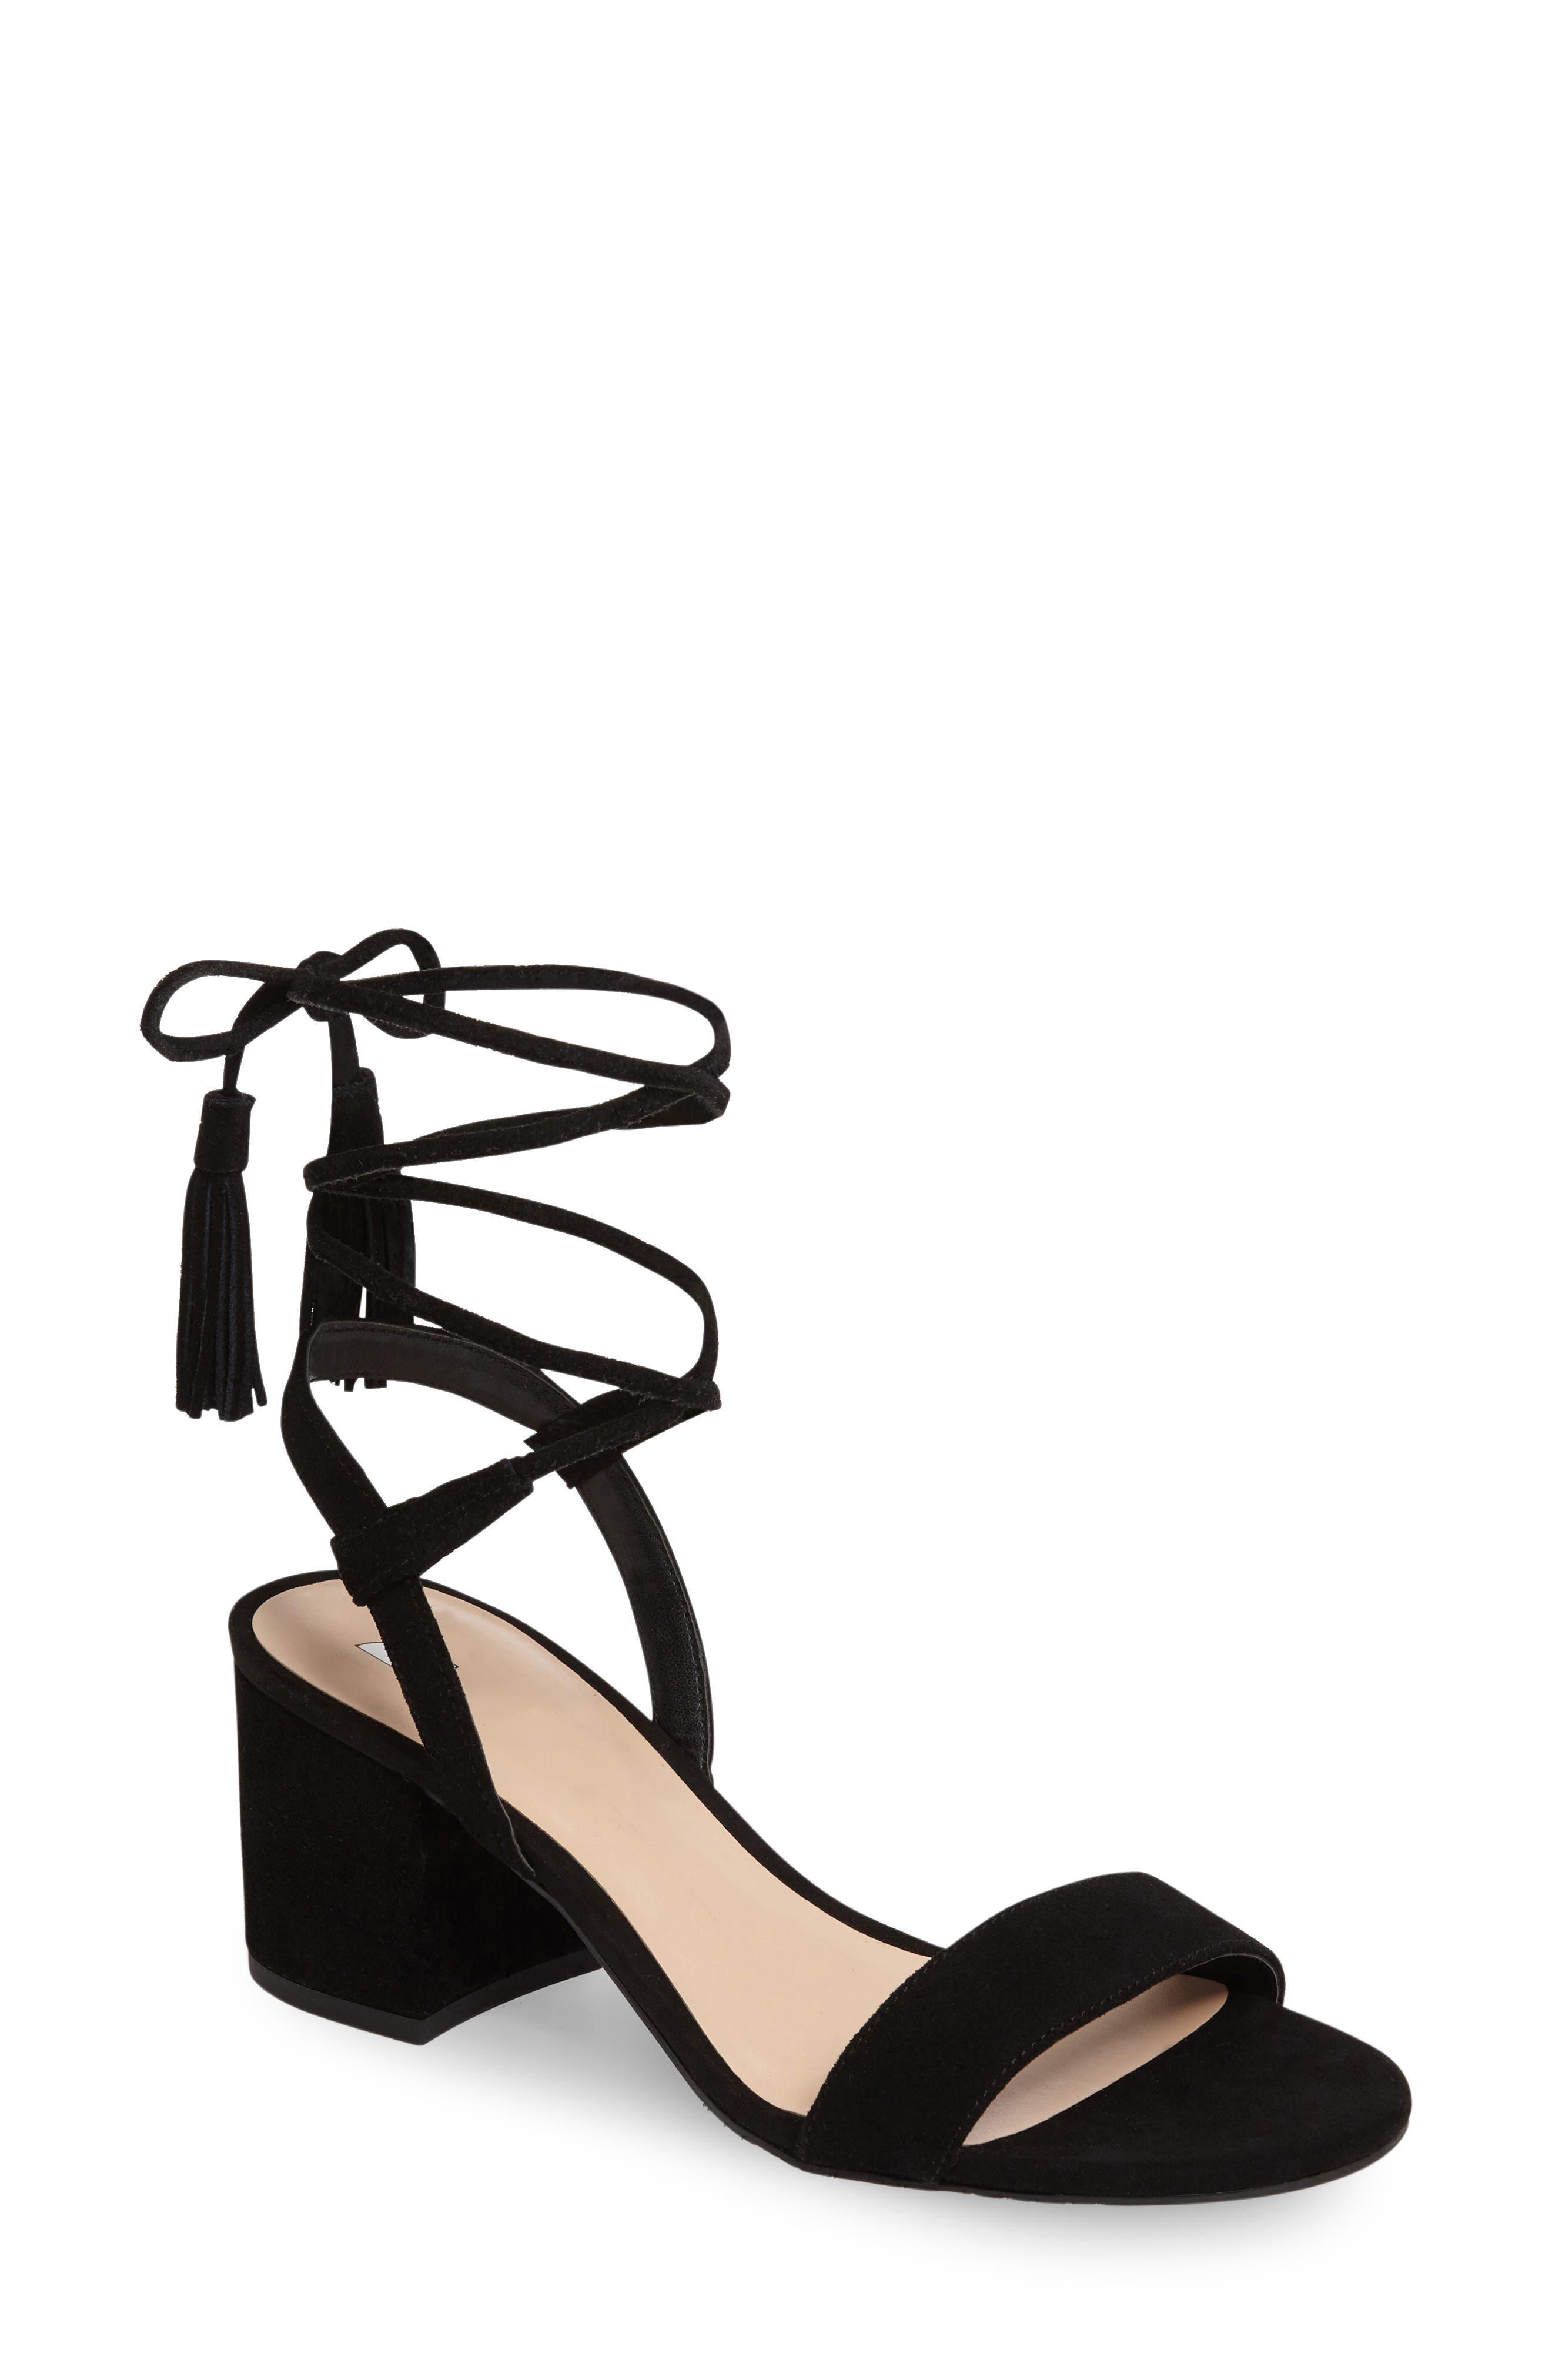 BP. Karla Block Heel Ankle Wrap Sandal, Main, color, 001